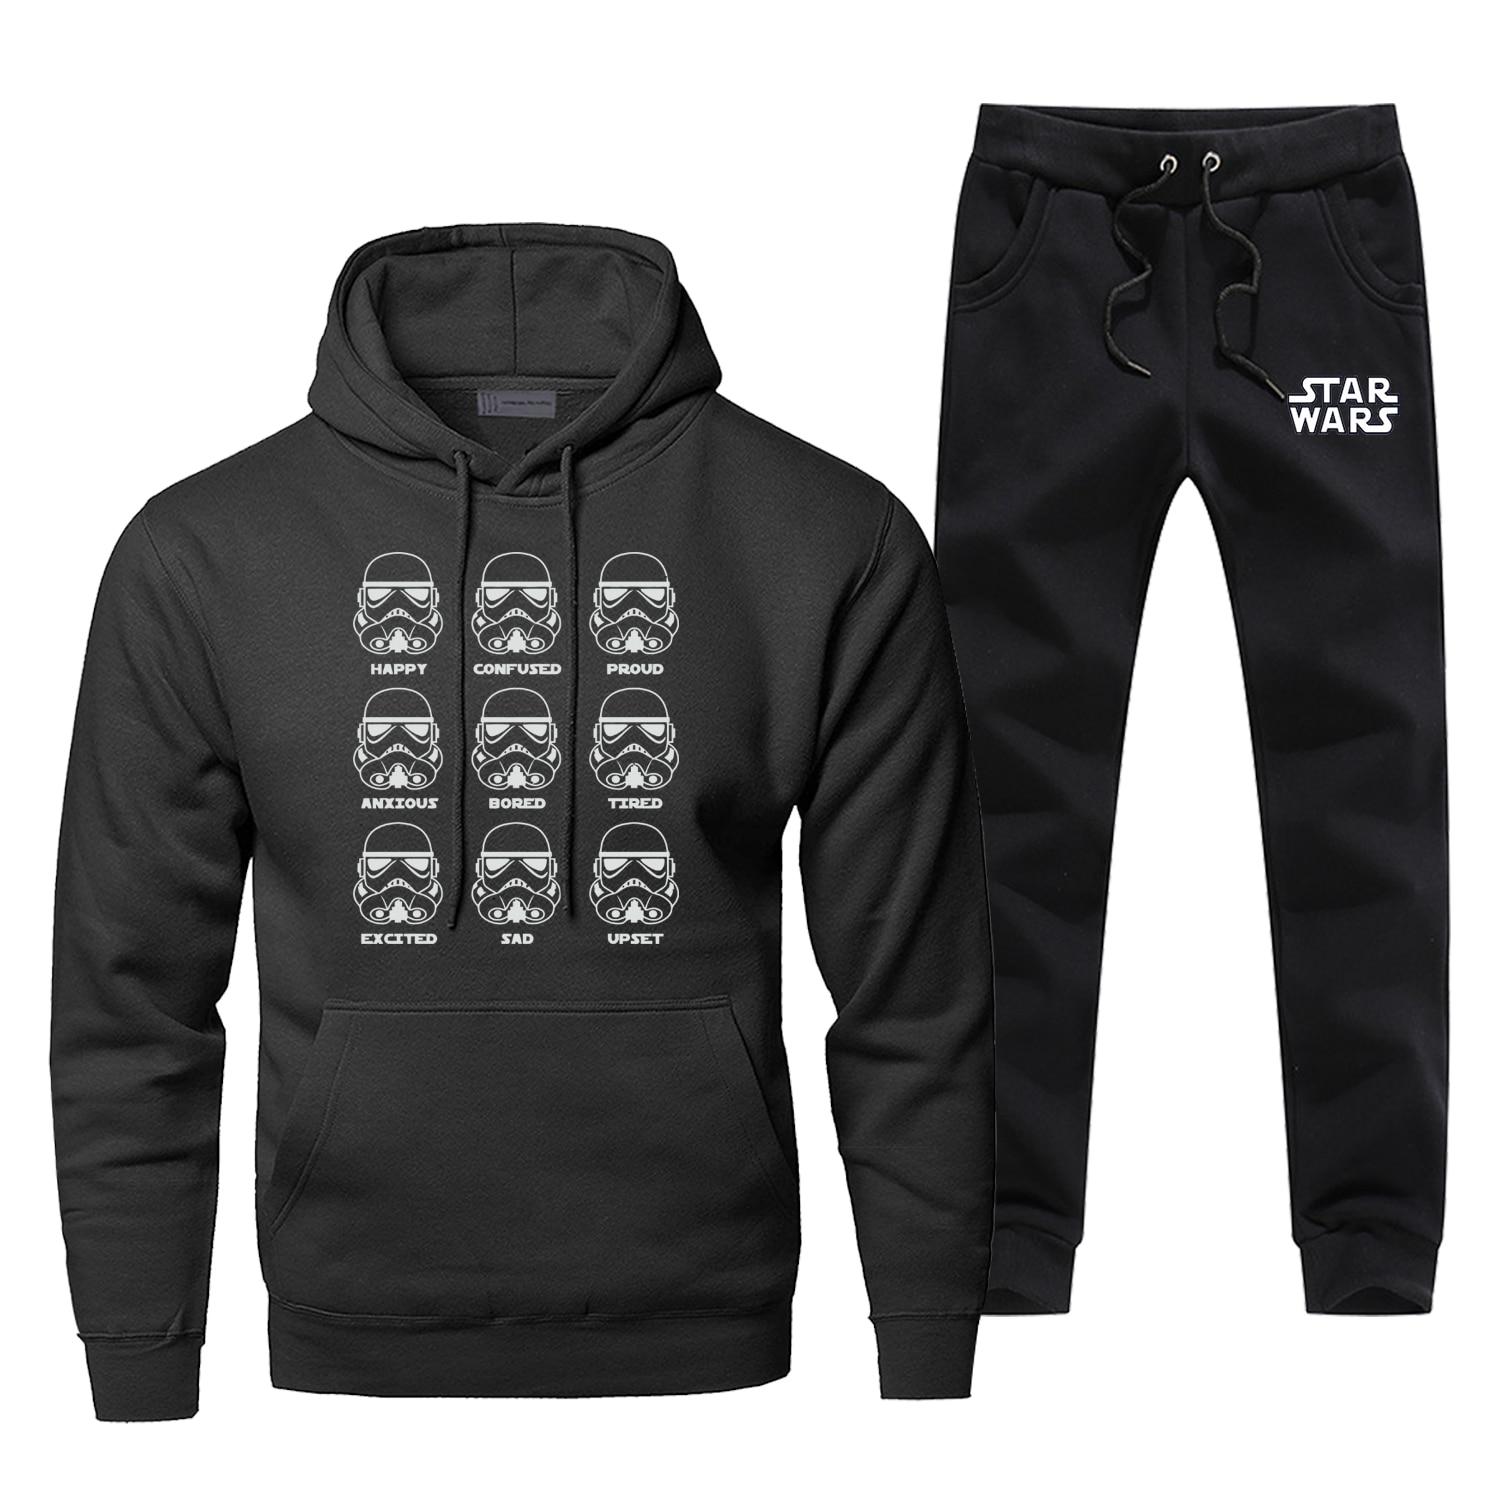 Fashion Star Wars Sweatshirt Funny Stormtrooper Emotions Hoodies Pants Sets Men Hip Hop Fleece Sportswear Harajuku Streetwear